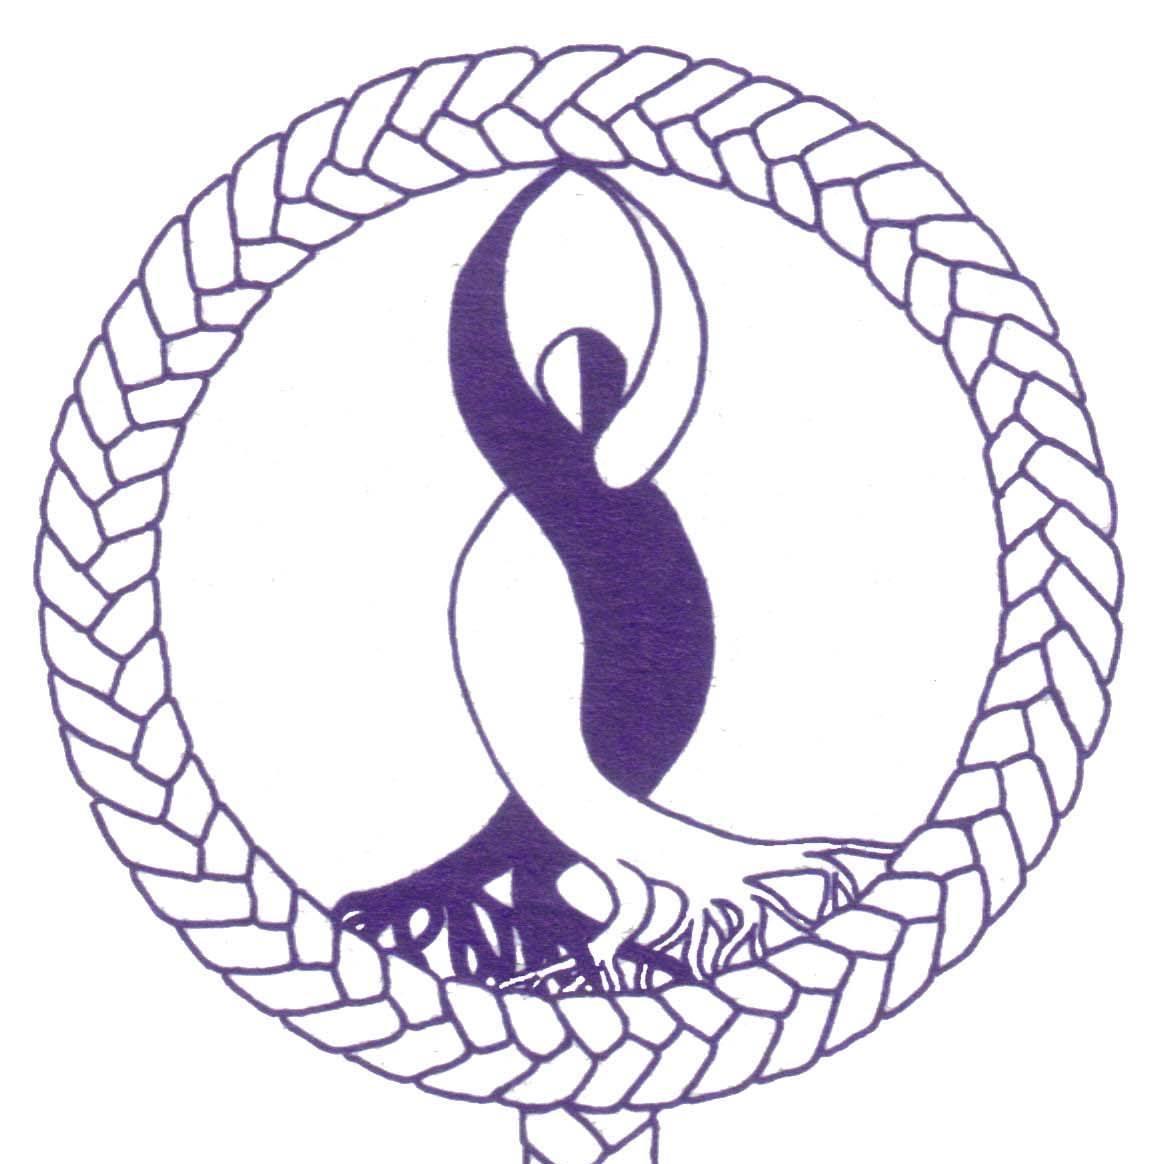 Muskoka Parry Sound Sexual Assault Services